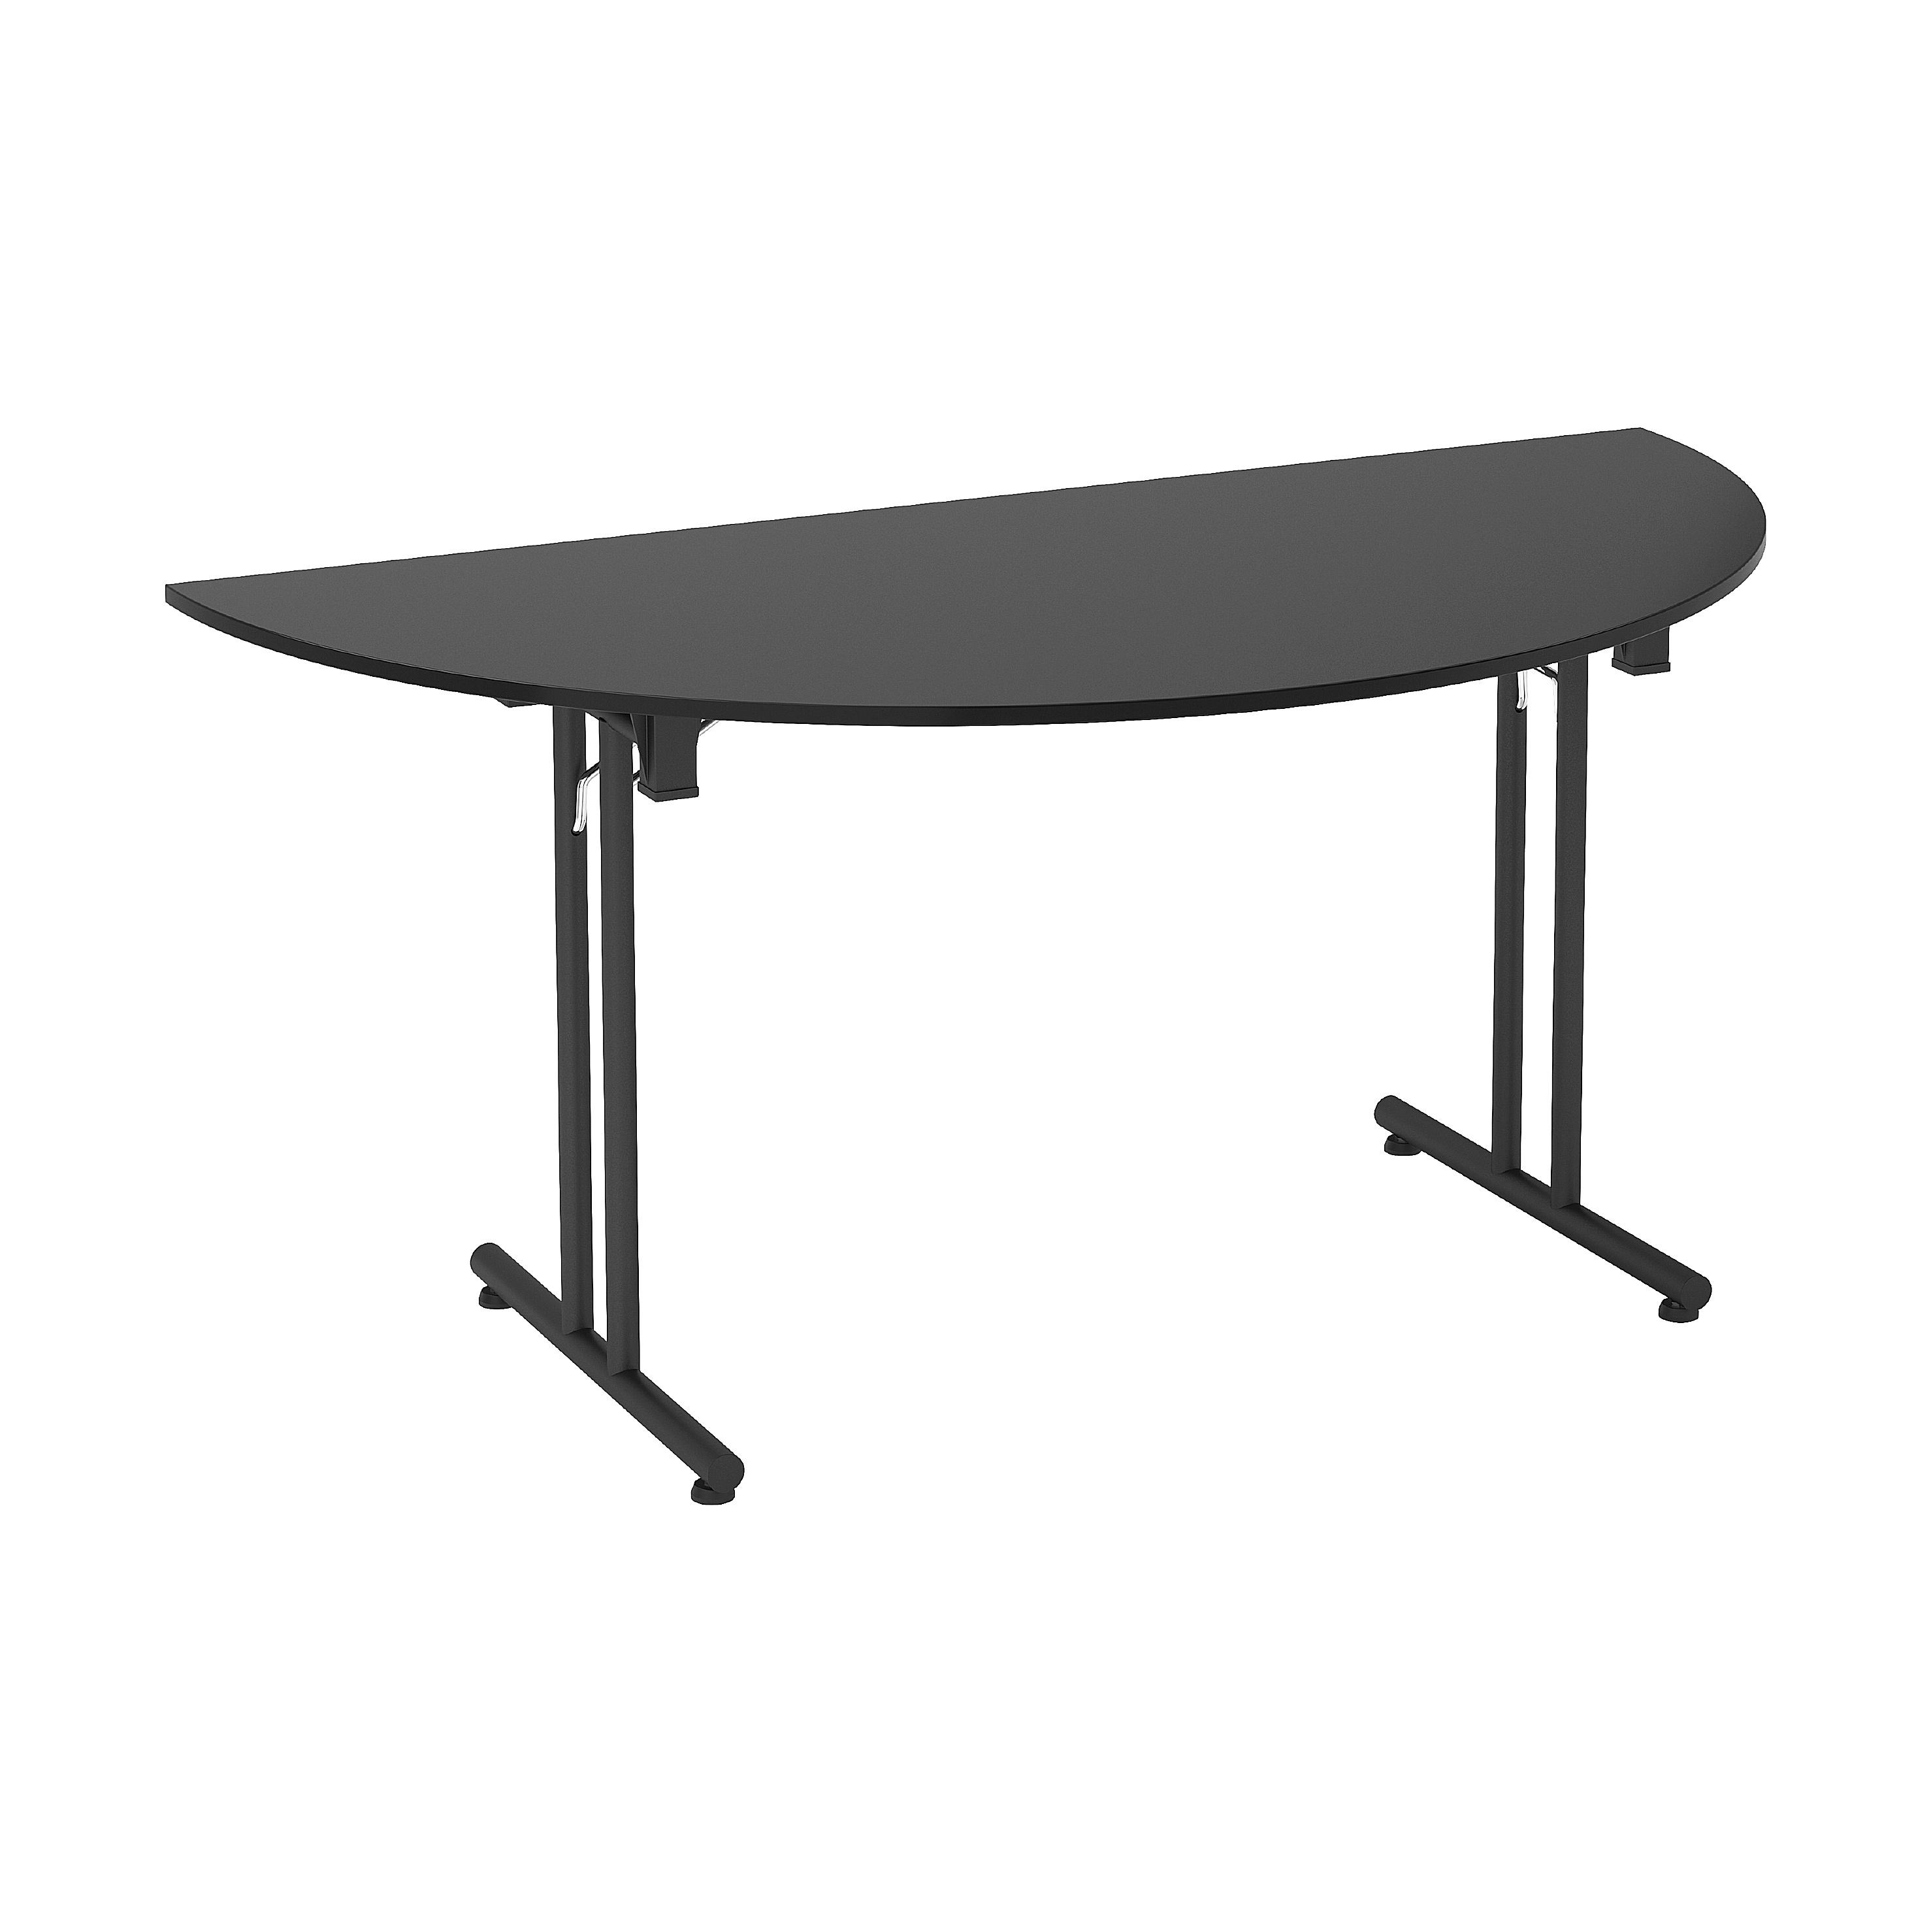 next day noir semi circular folding tables folding tables on Circular Folding Dining Table id=21056